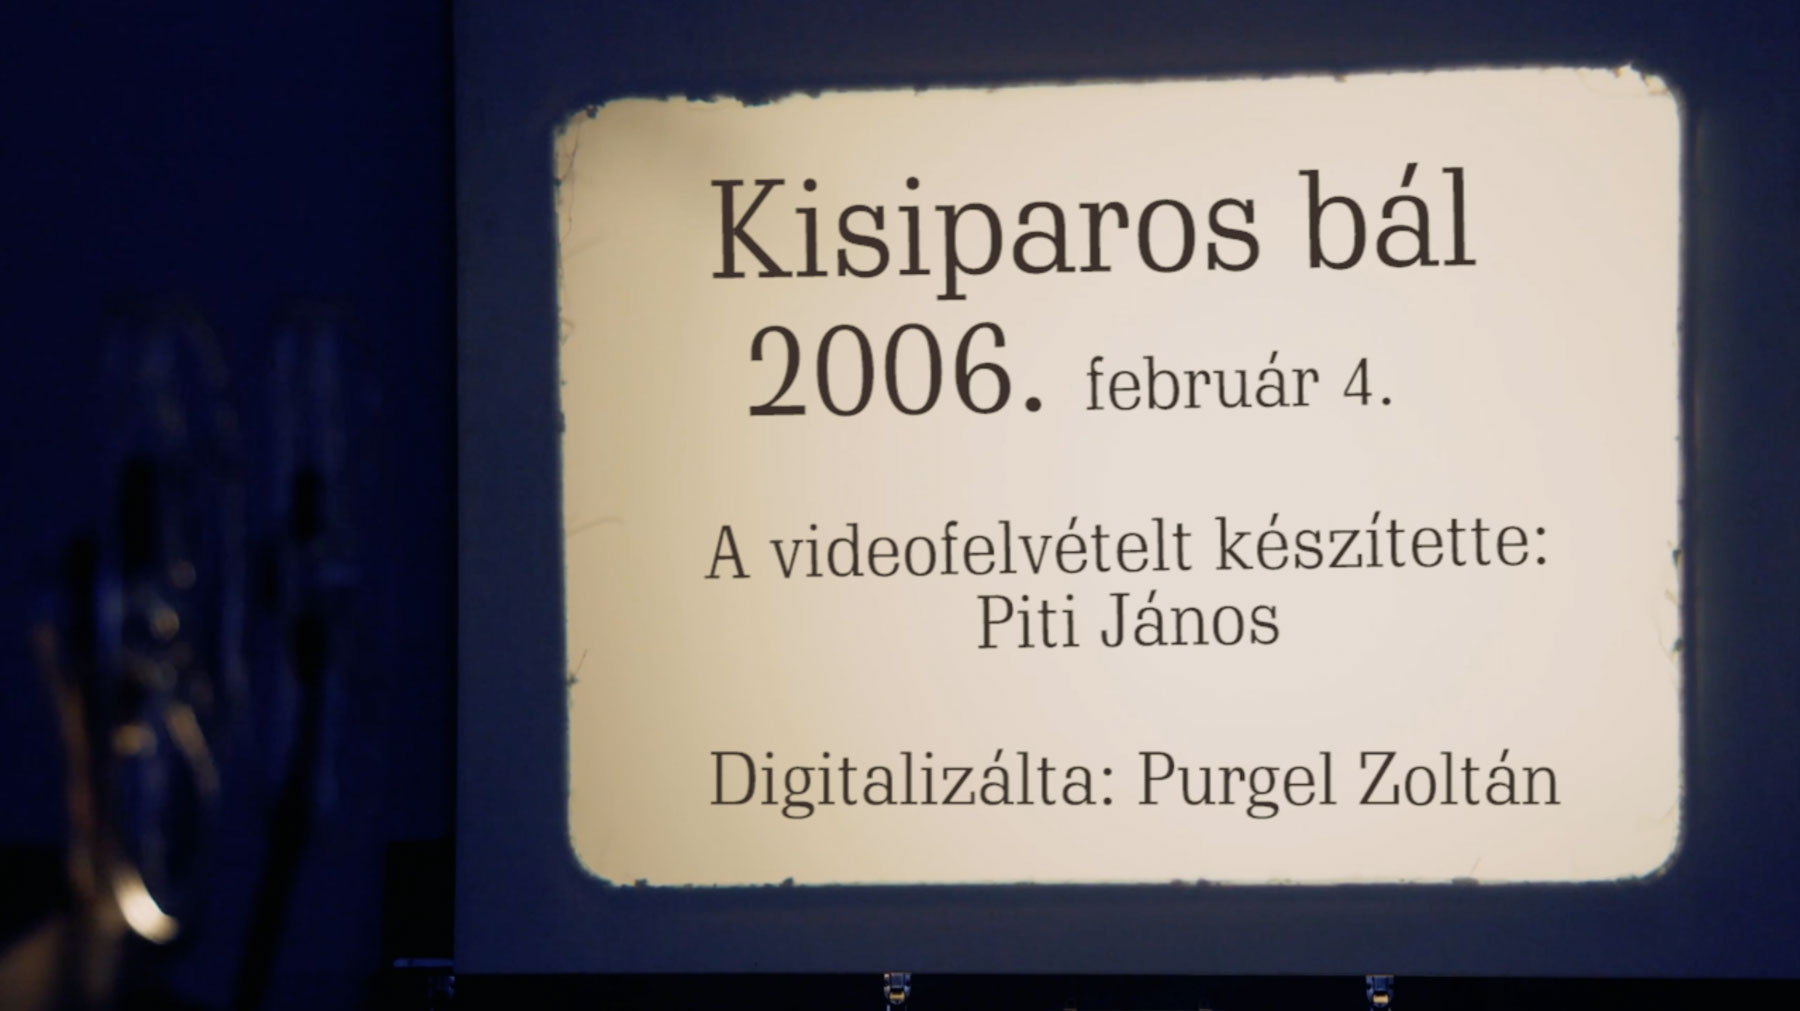 Kisiparos bál – 2006.